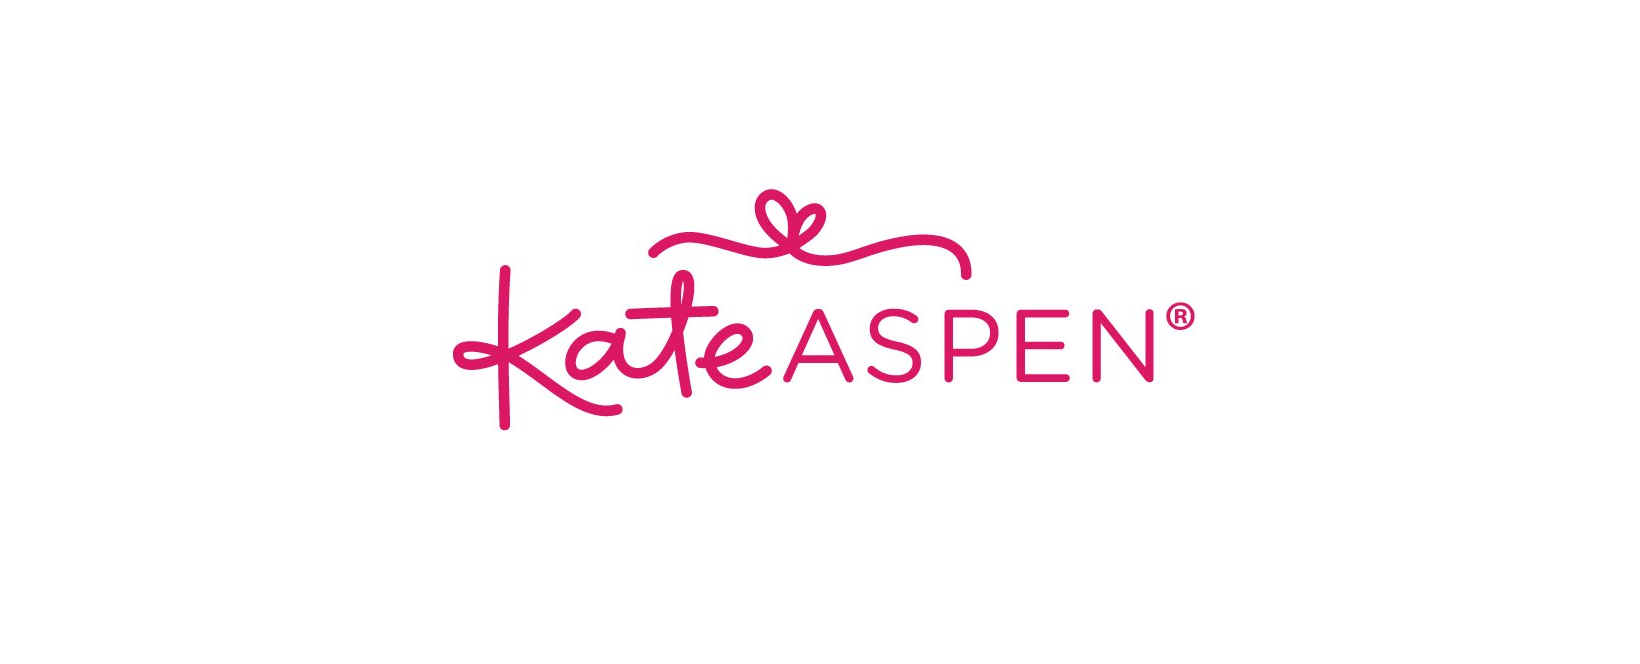 Kate Aspen Coupon Code 2021